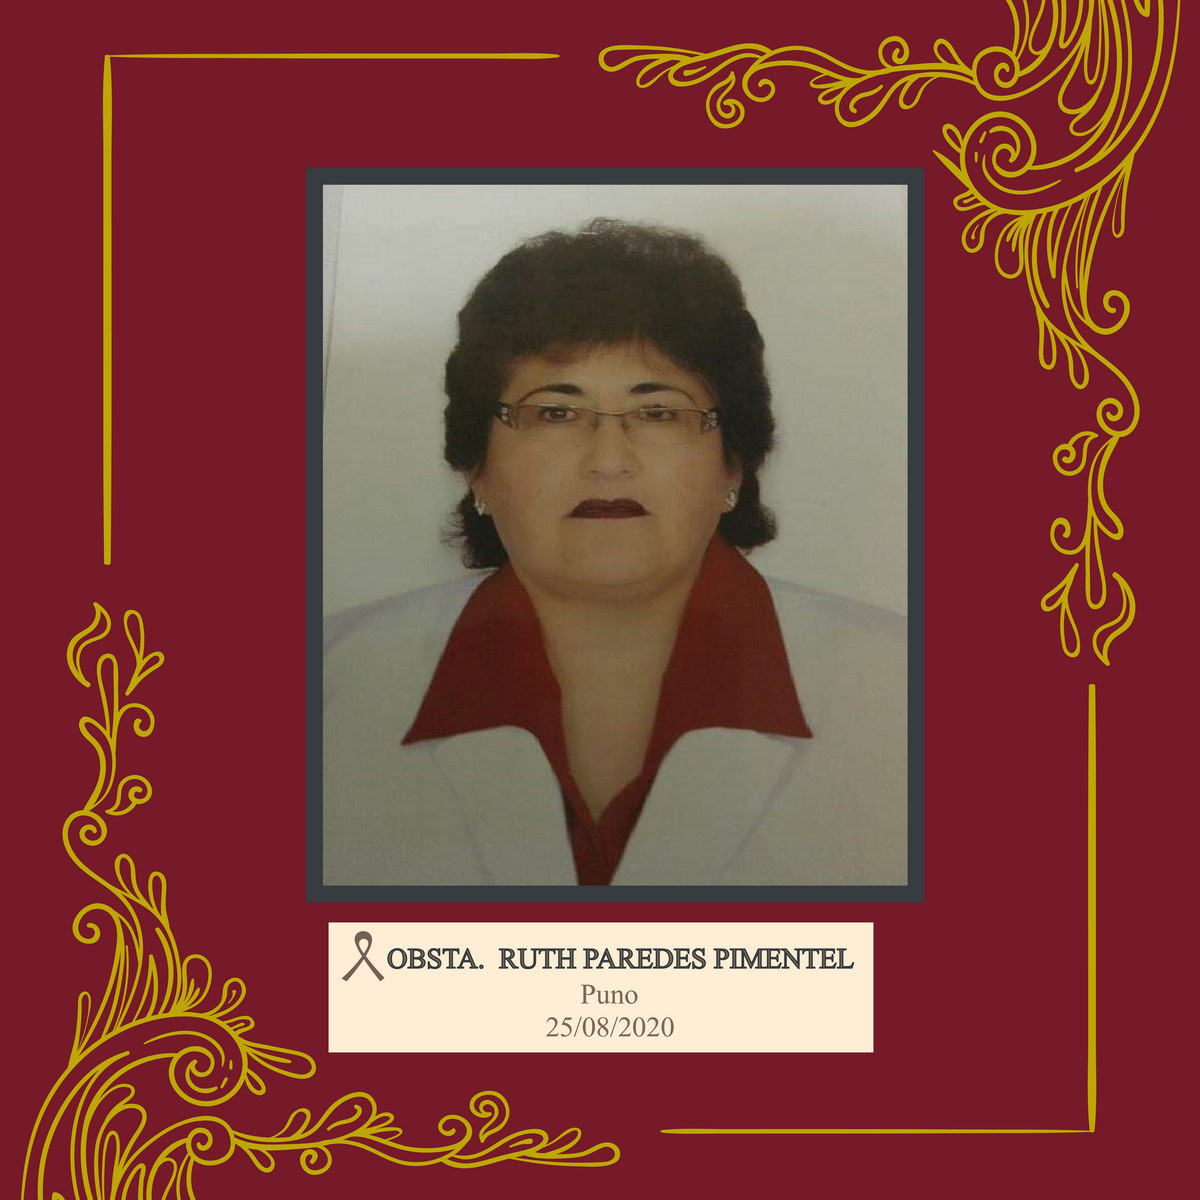 Ruth Amanda Paredes Pimentel